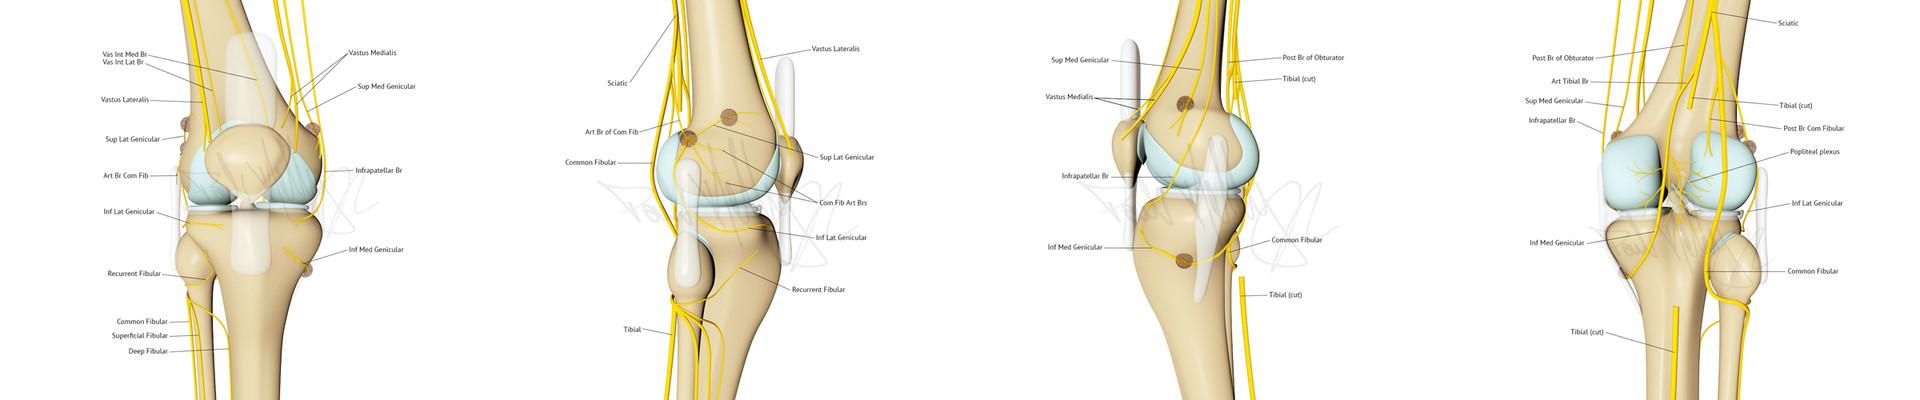 Knee Innervation spread 3